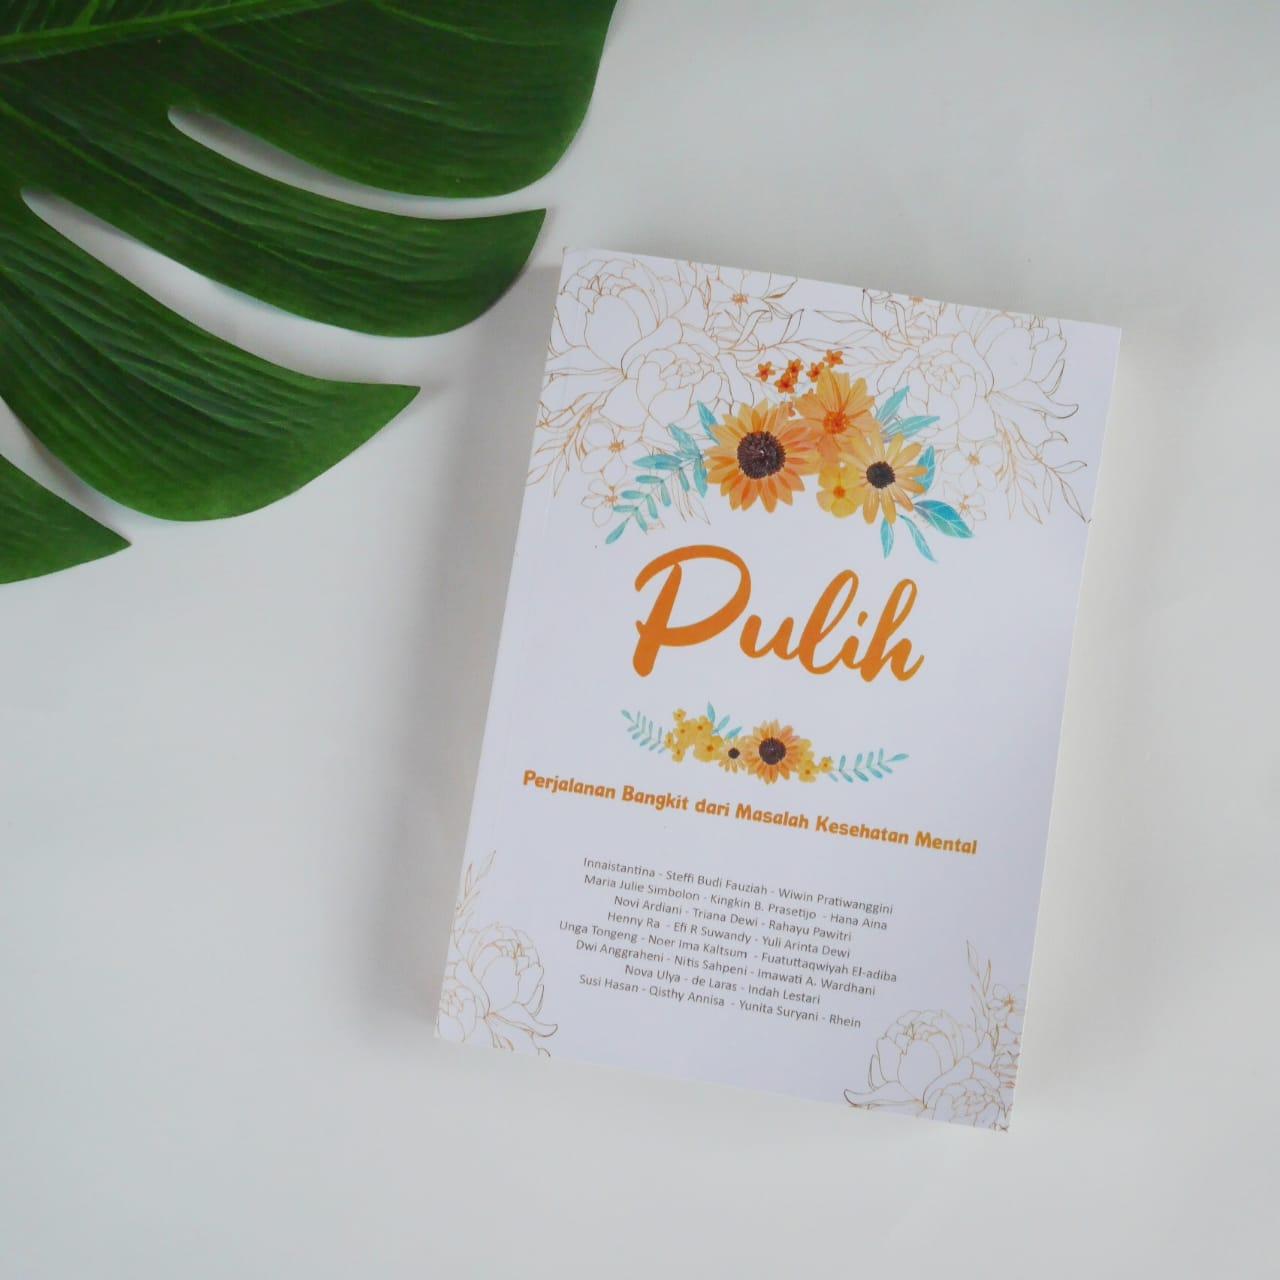 Launching buku Pulih bersama komunitas IIDn